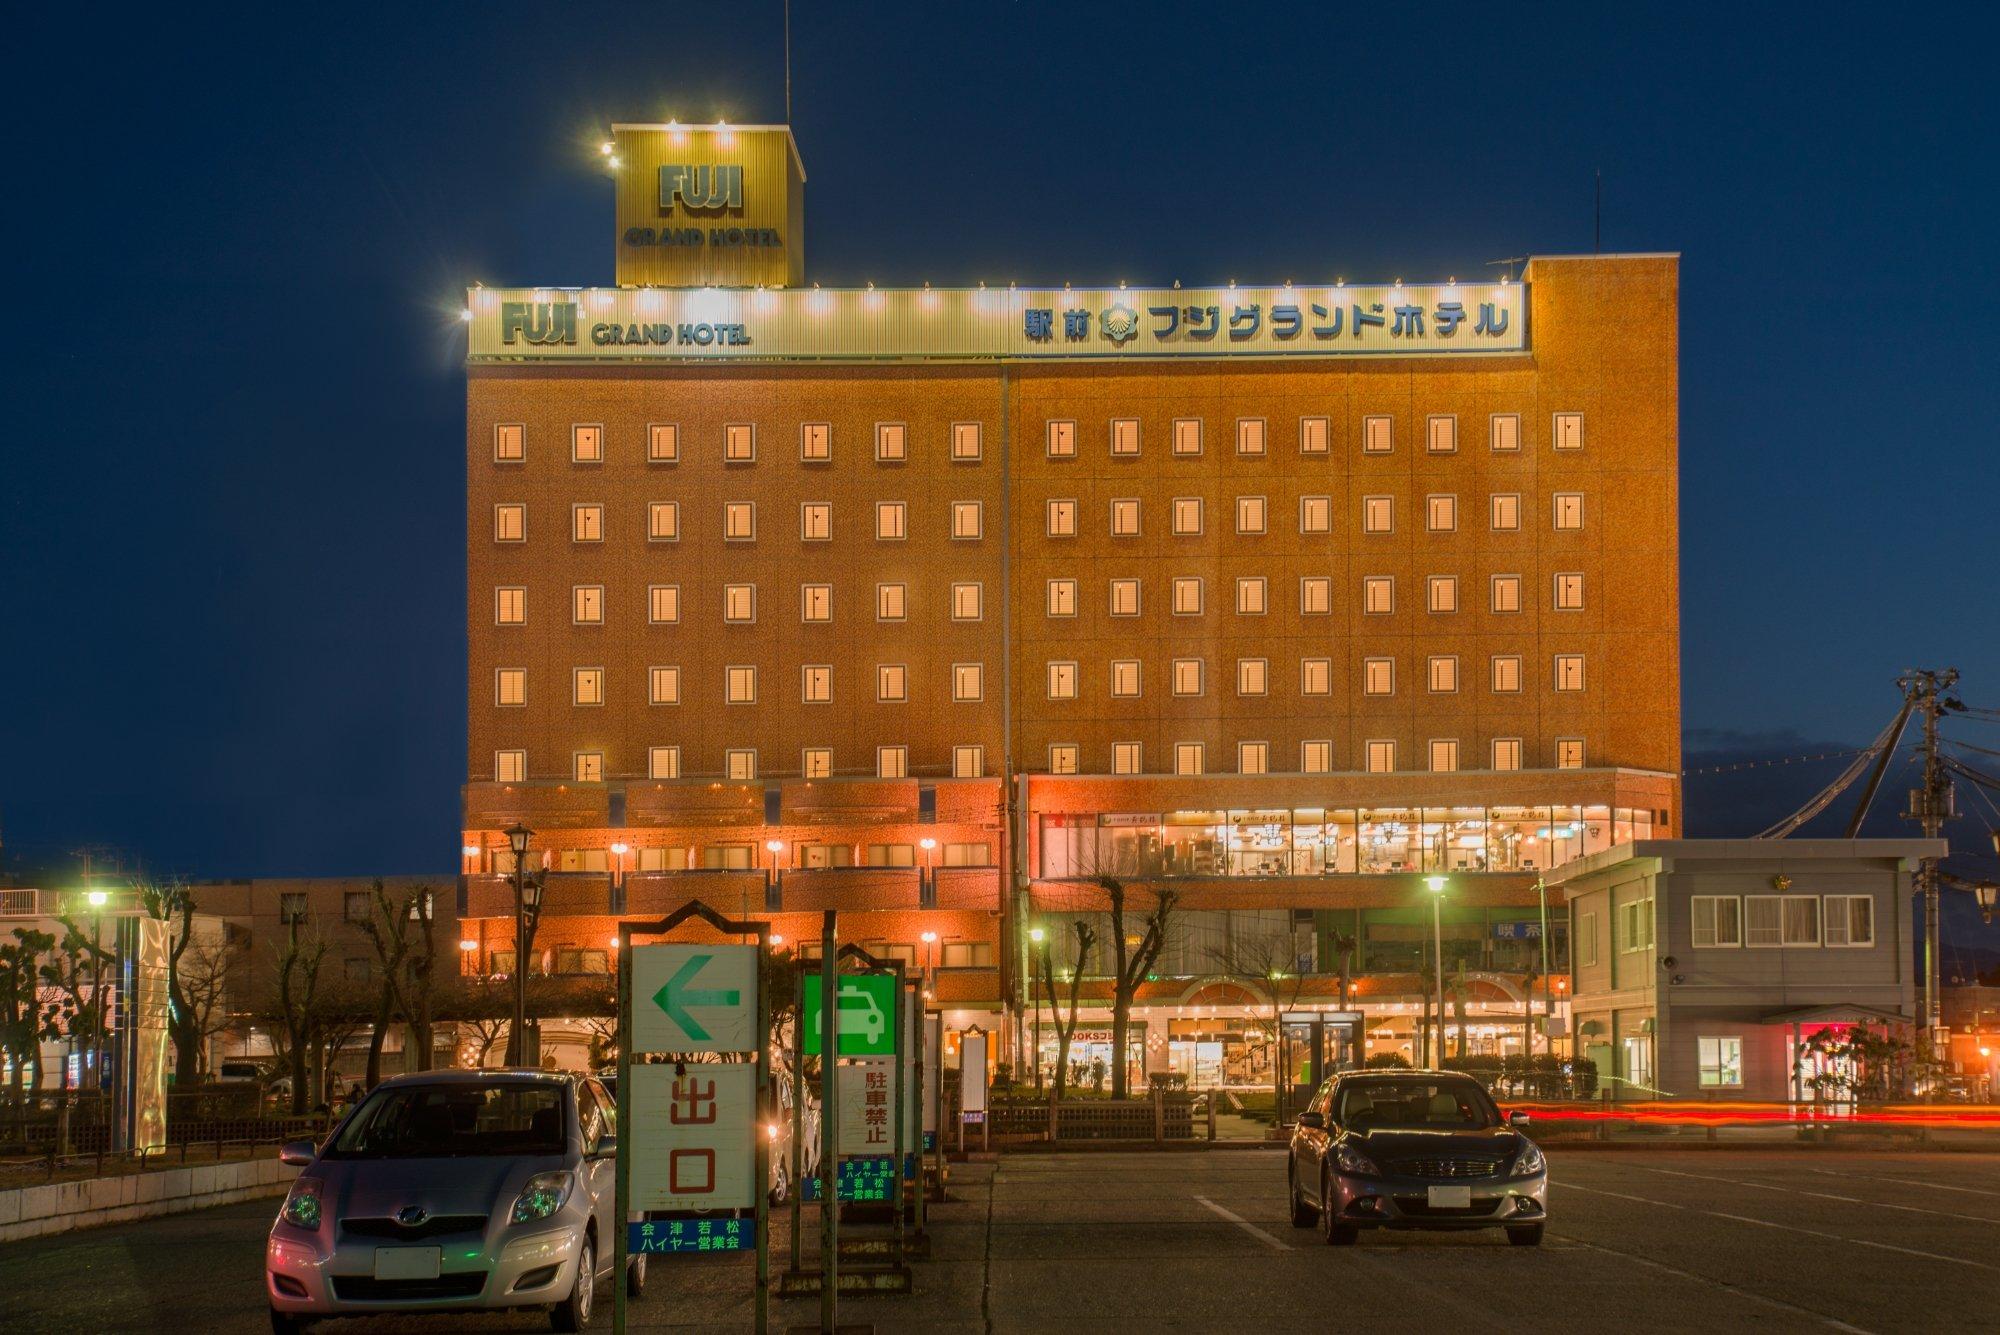 Ekimae Fuji Grand Hotel